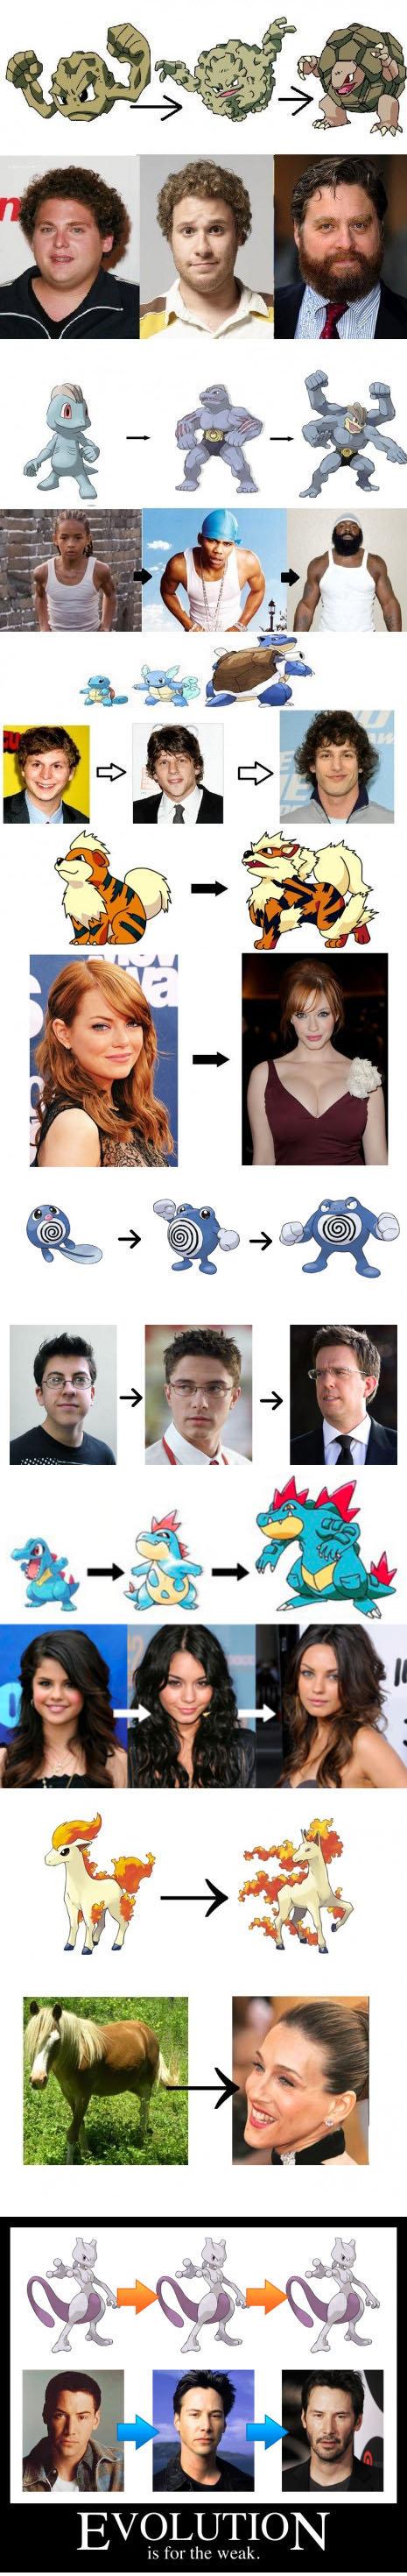 14 Celebrity Pokemon Evolutions | WeKnowMemes